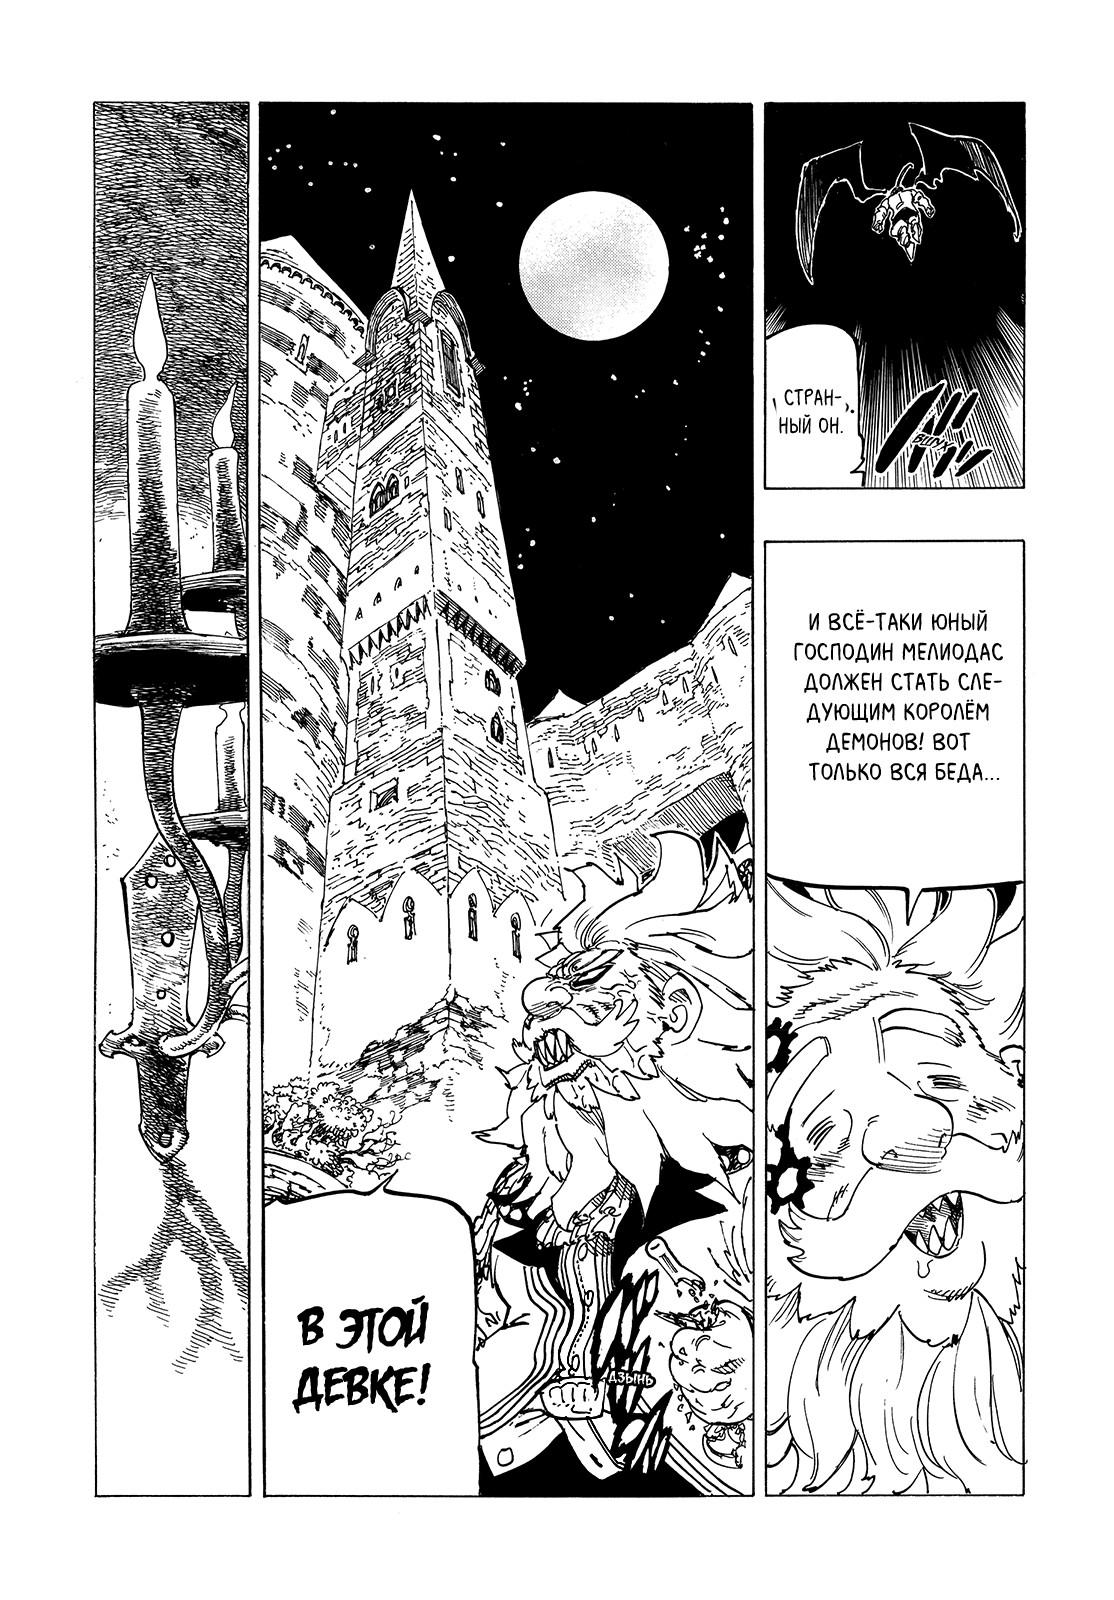 https://r1.ninemanga.com/comics/pic2/29/22109/389552/1514585440297.jpg Page 4